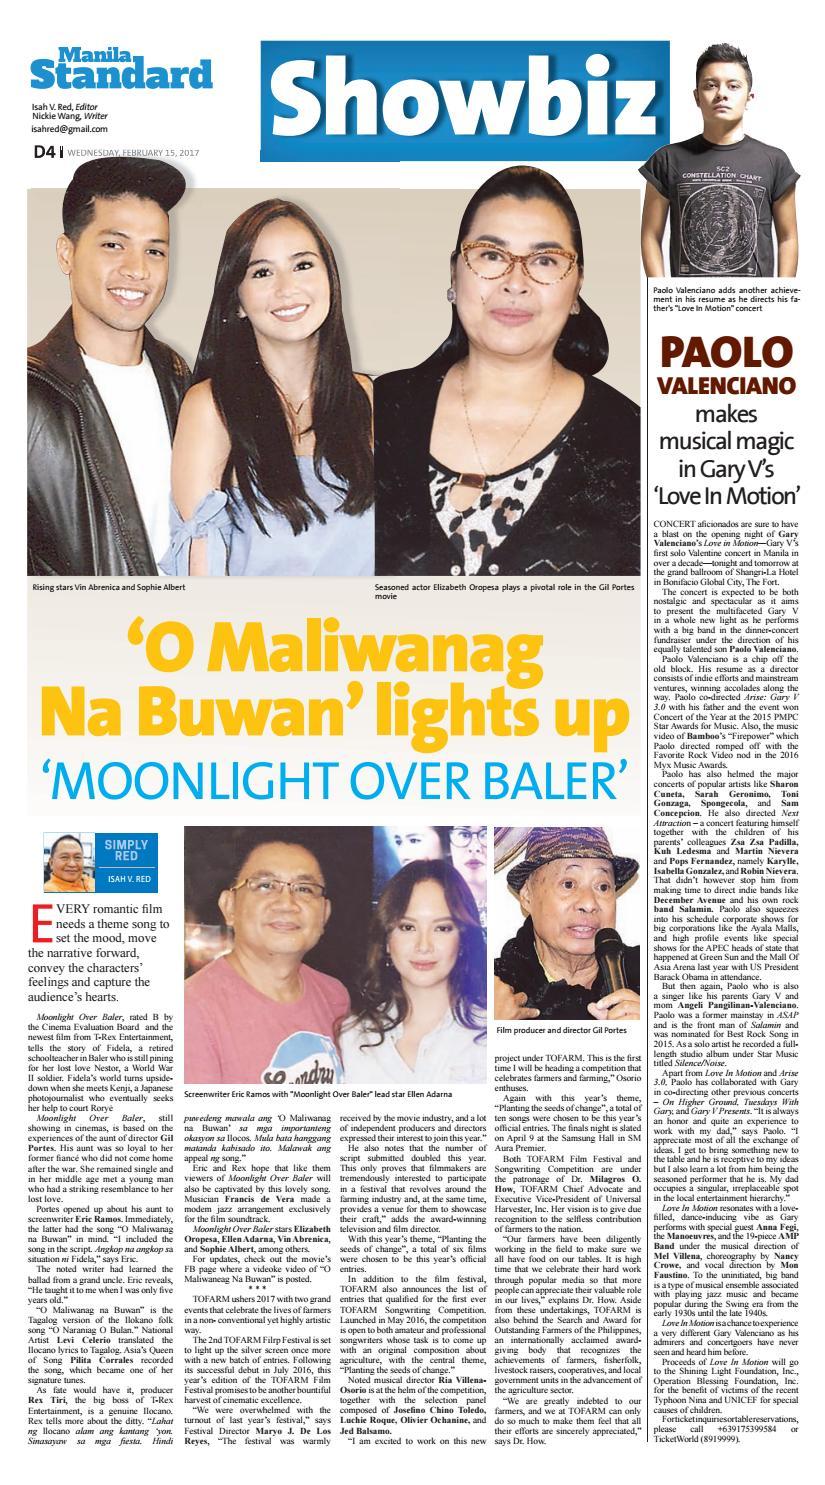 Manila Standard - 2017 February 15 - Wednesday by Manila